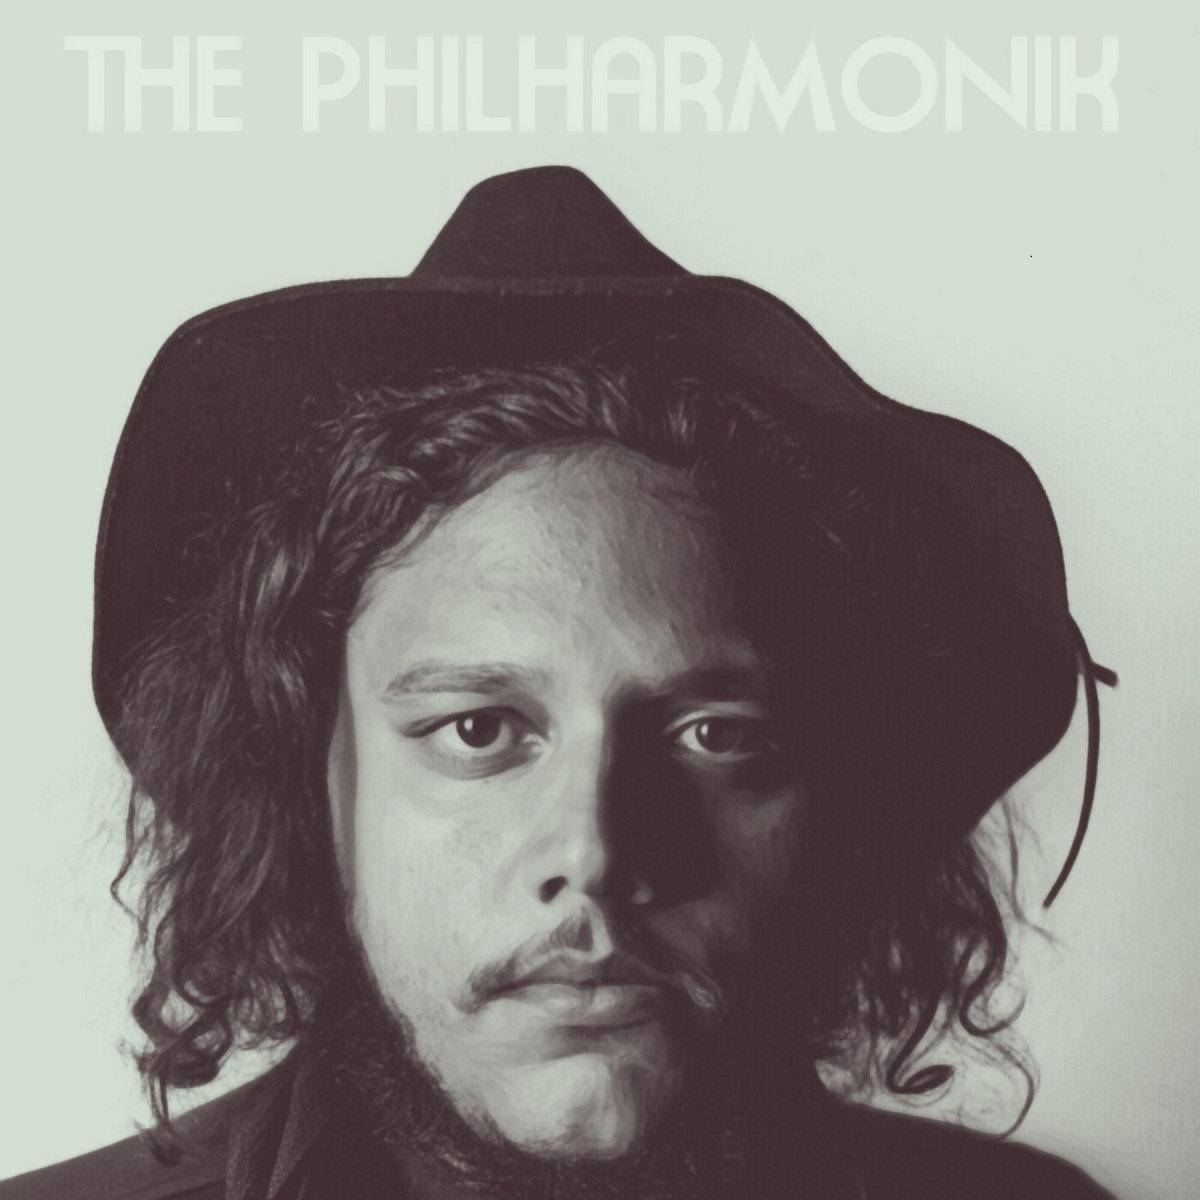 THE PHILHARMONIK - THE PHILHARMONIK